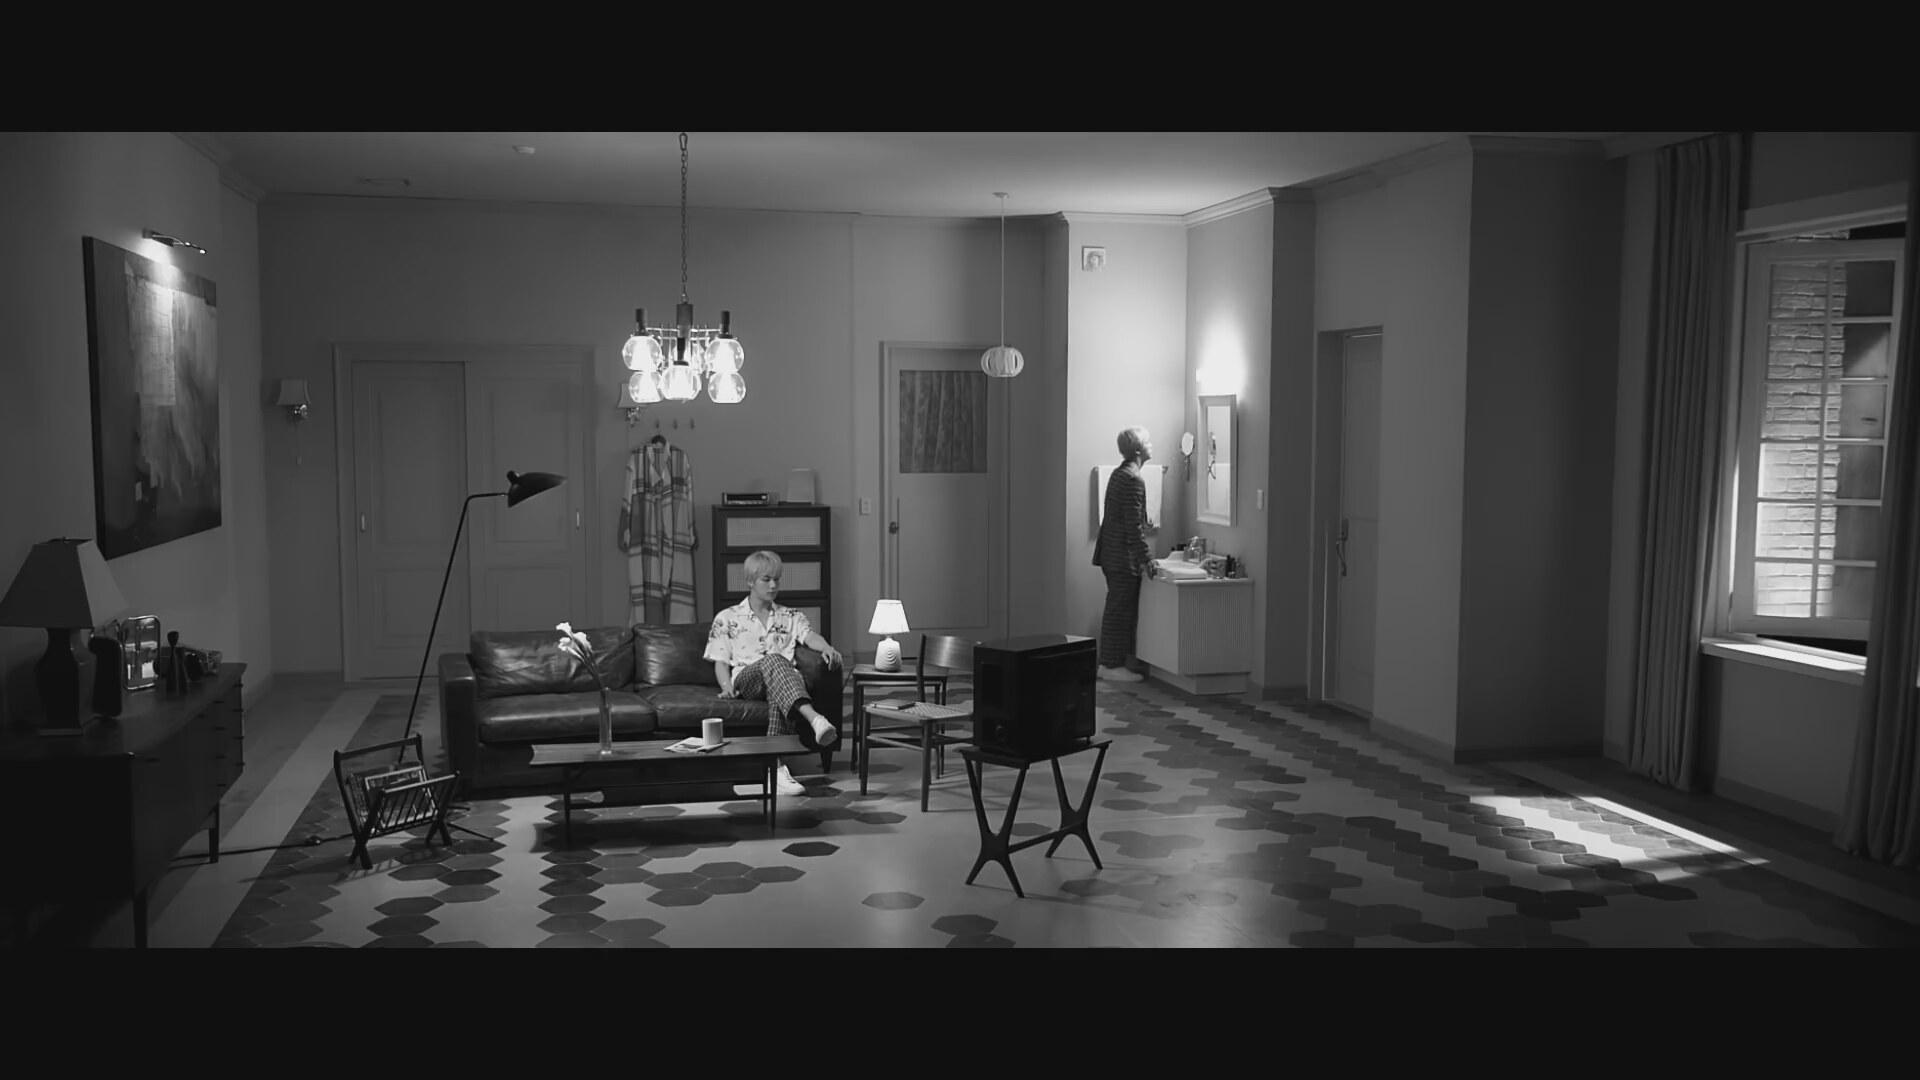 Bts Love Yourself Answer Epiphany Comeback Trailer Izlesene Com